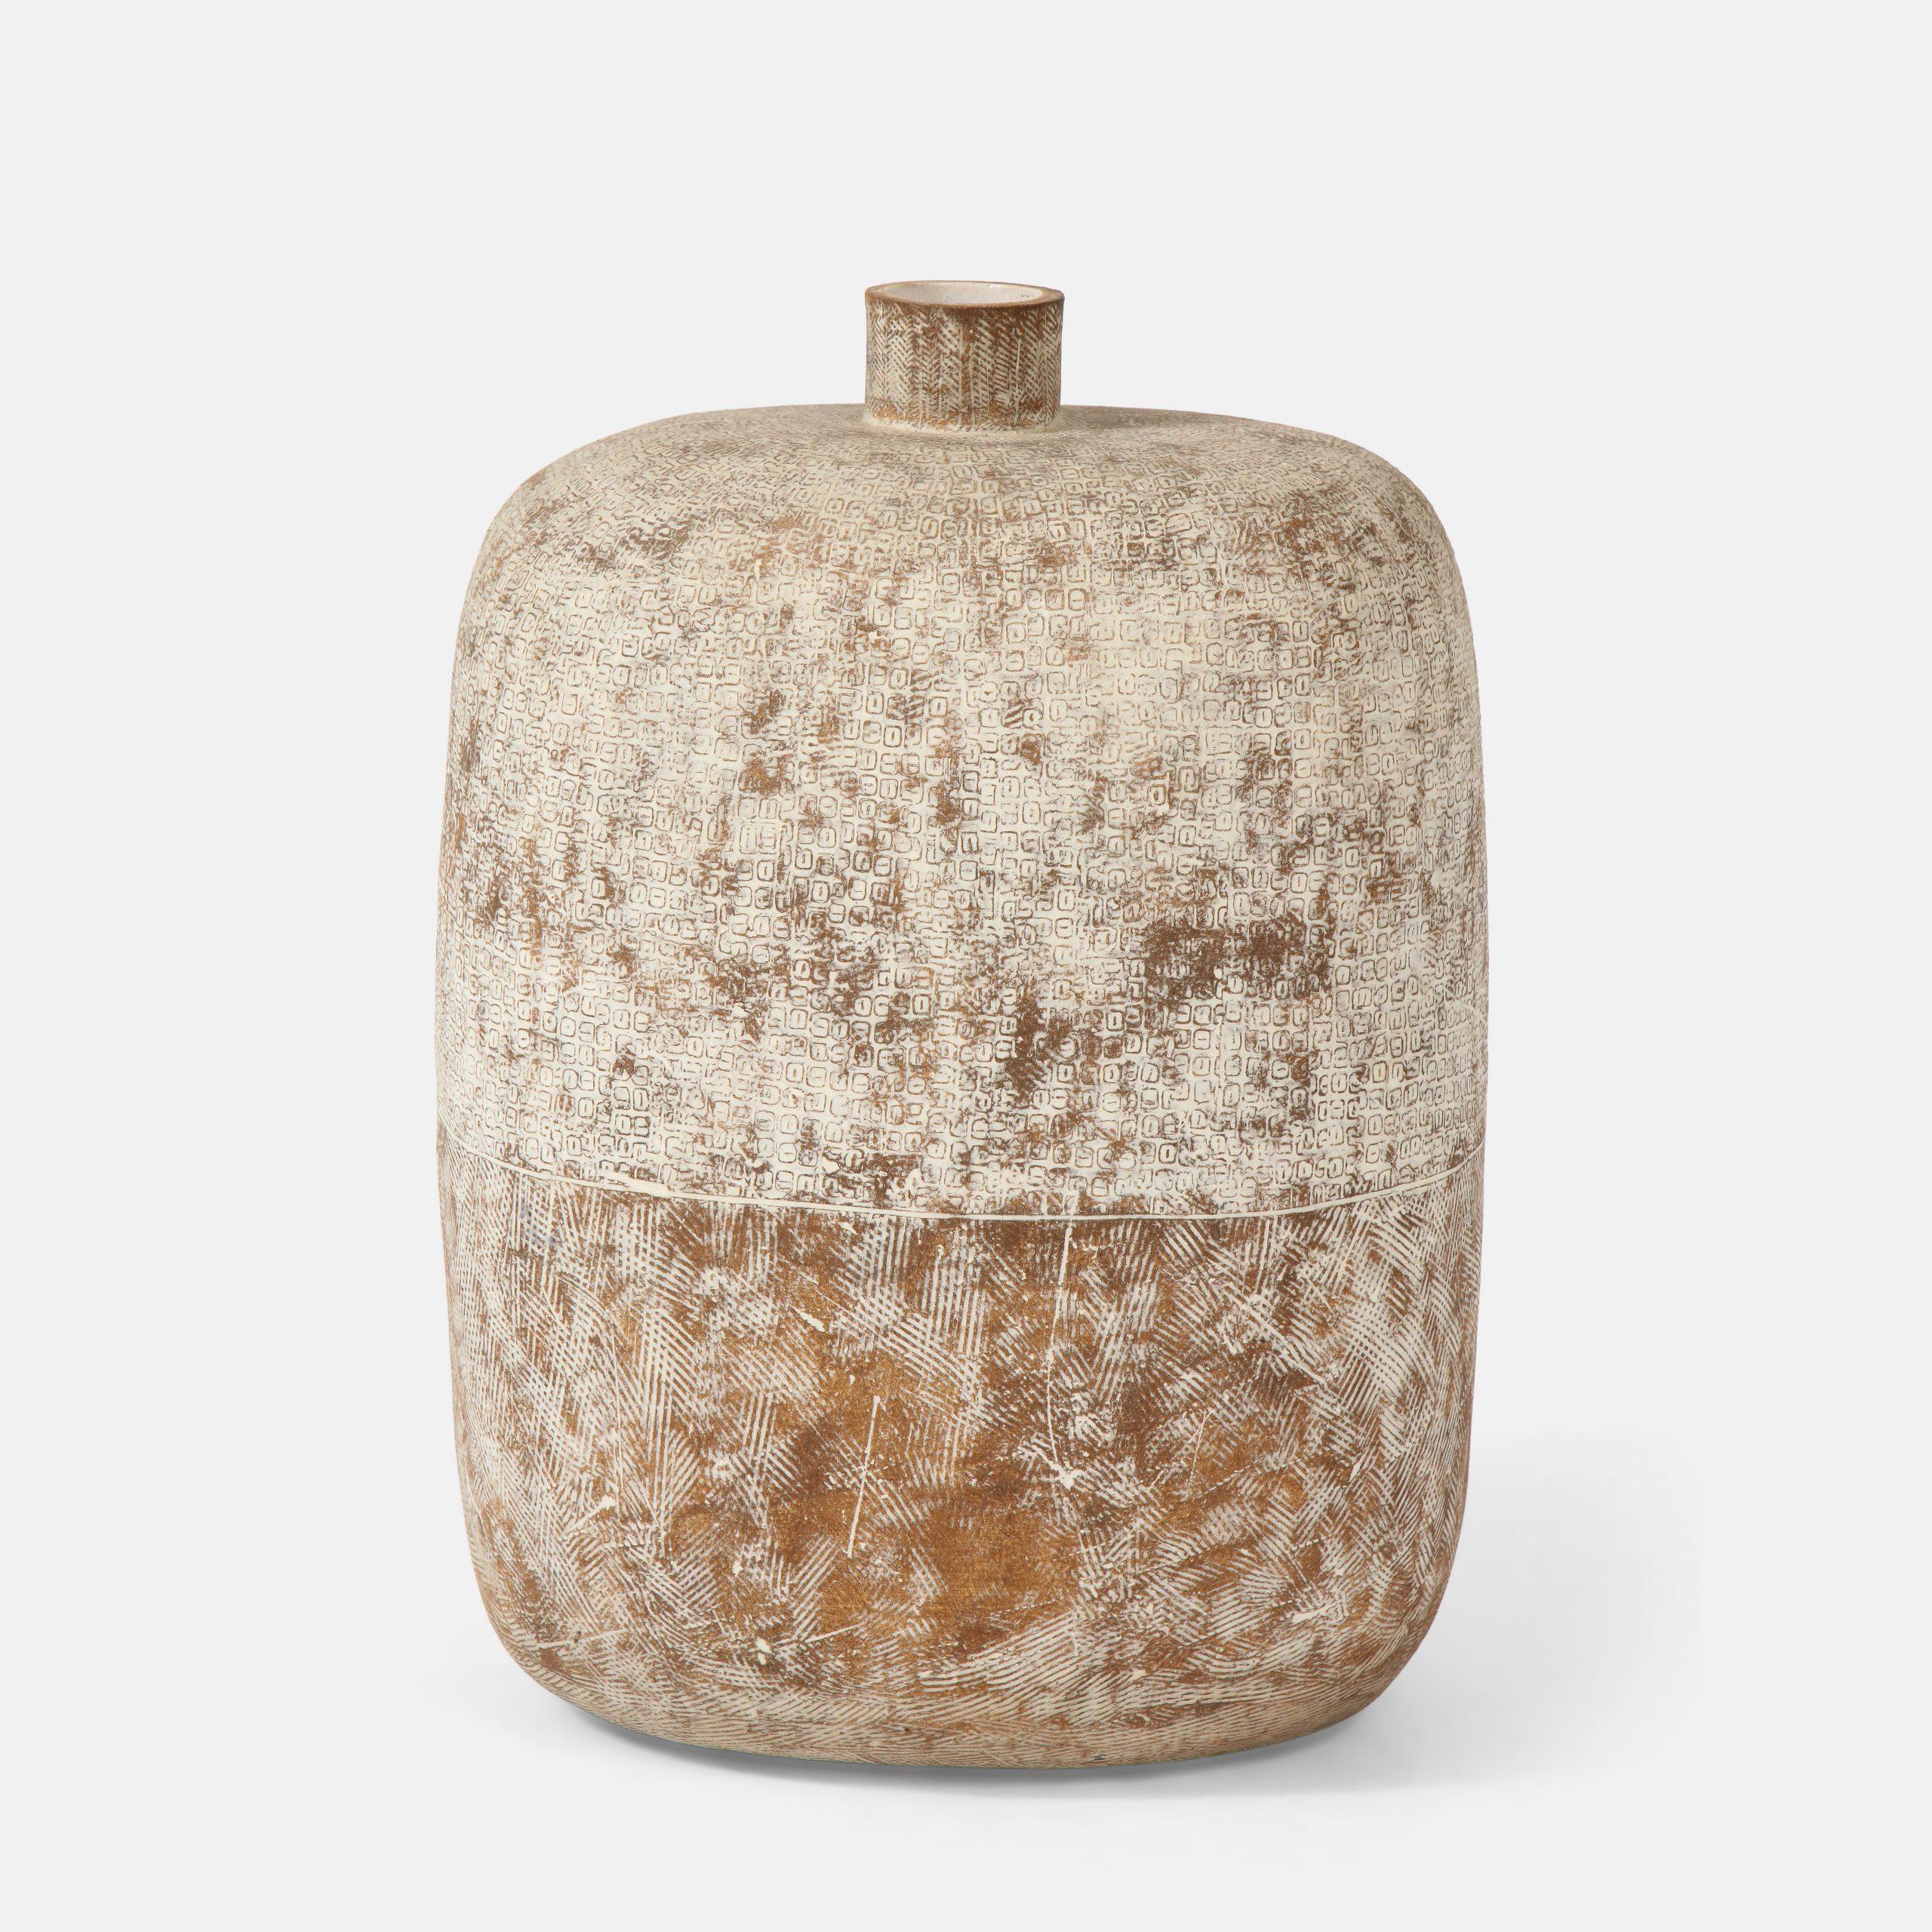 'Blueb' Ceramic Vessel by Claude Conover | soyun k.